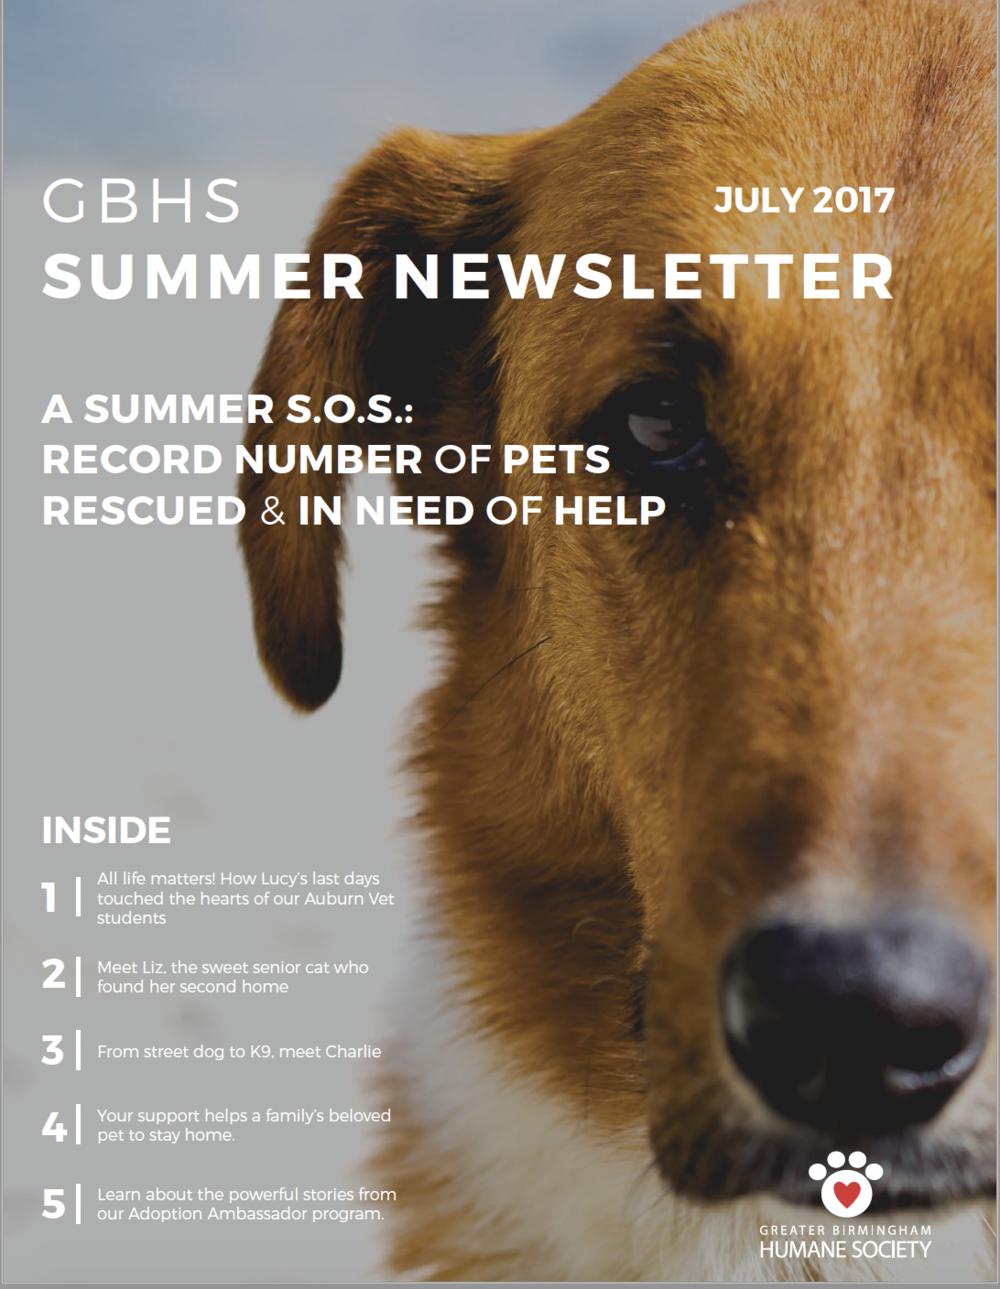 GBHS SUMMER NEWSLETTER -